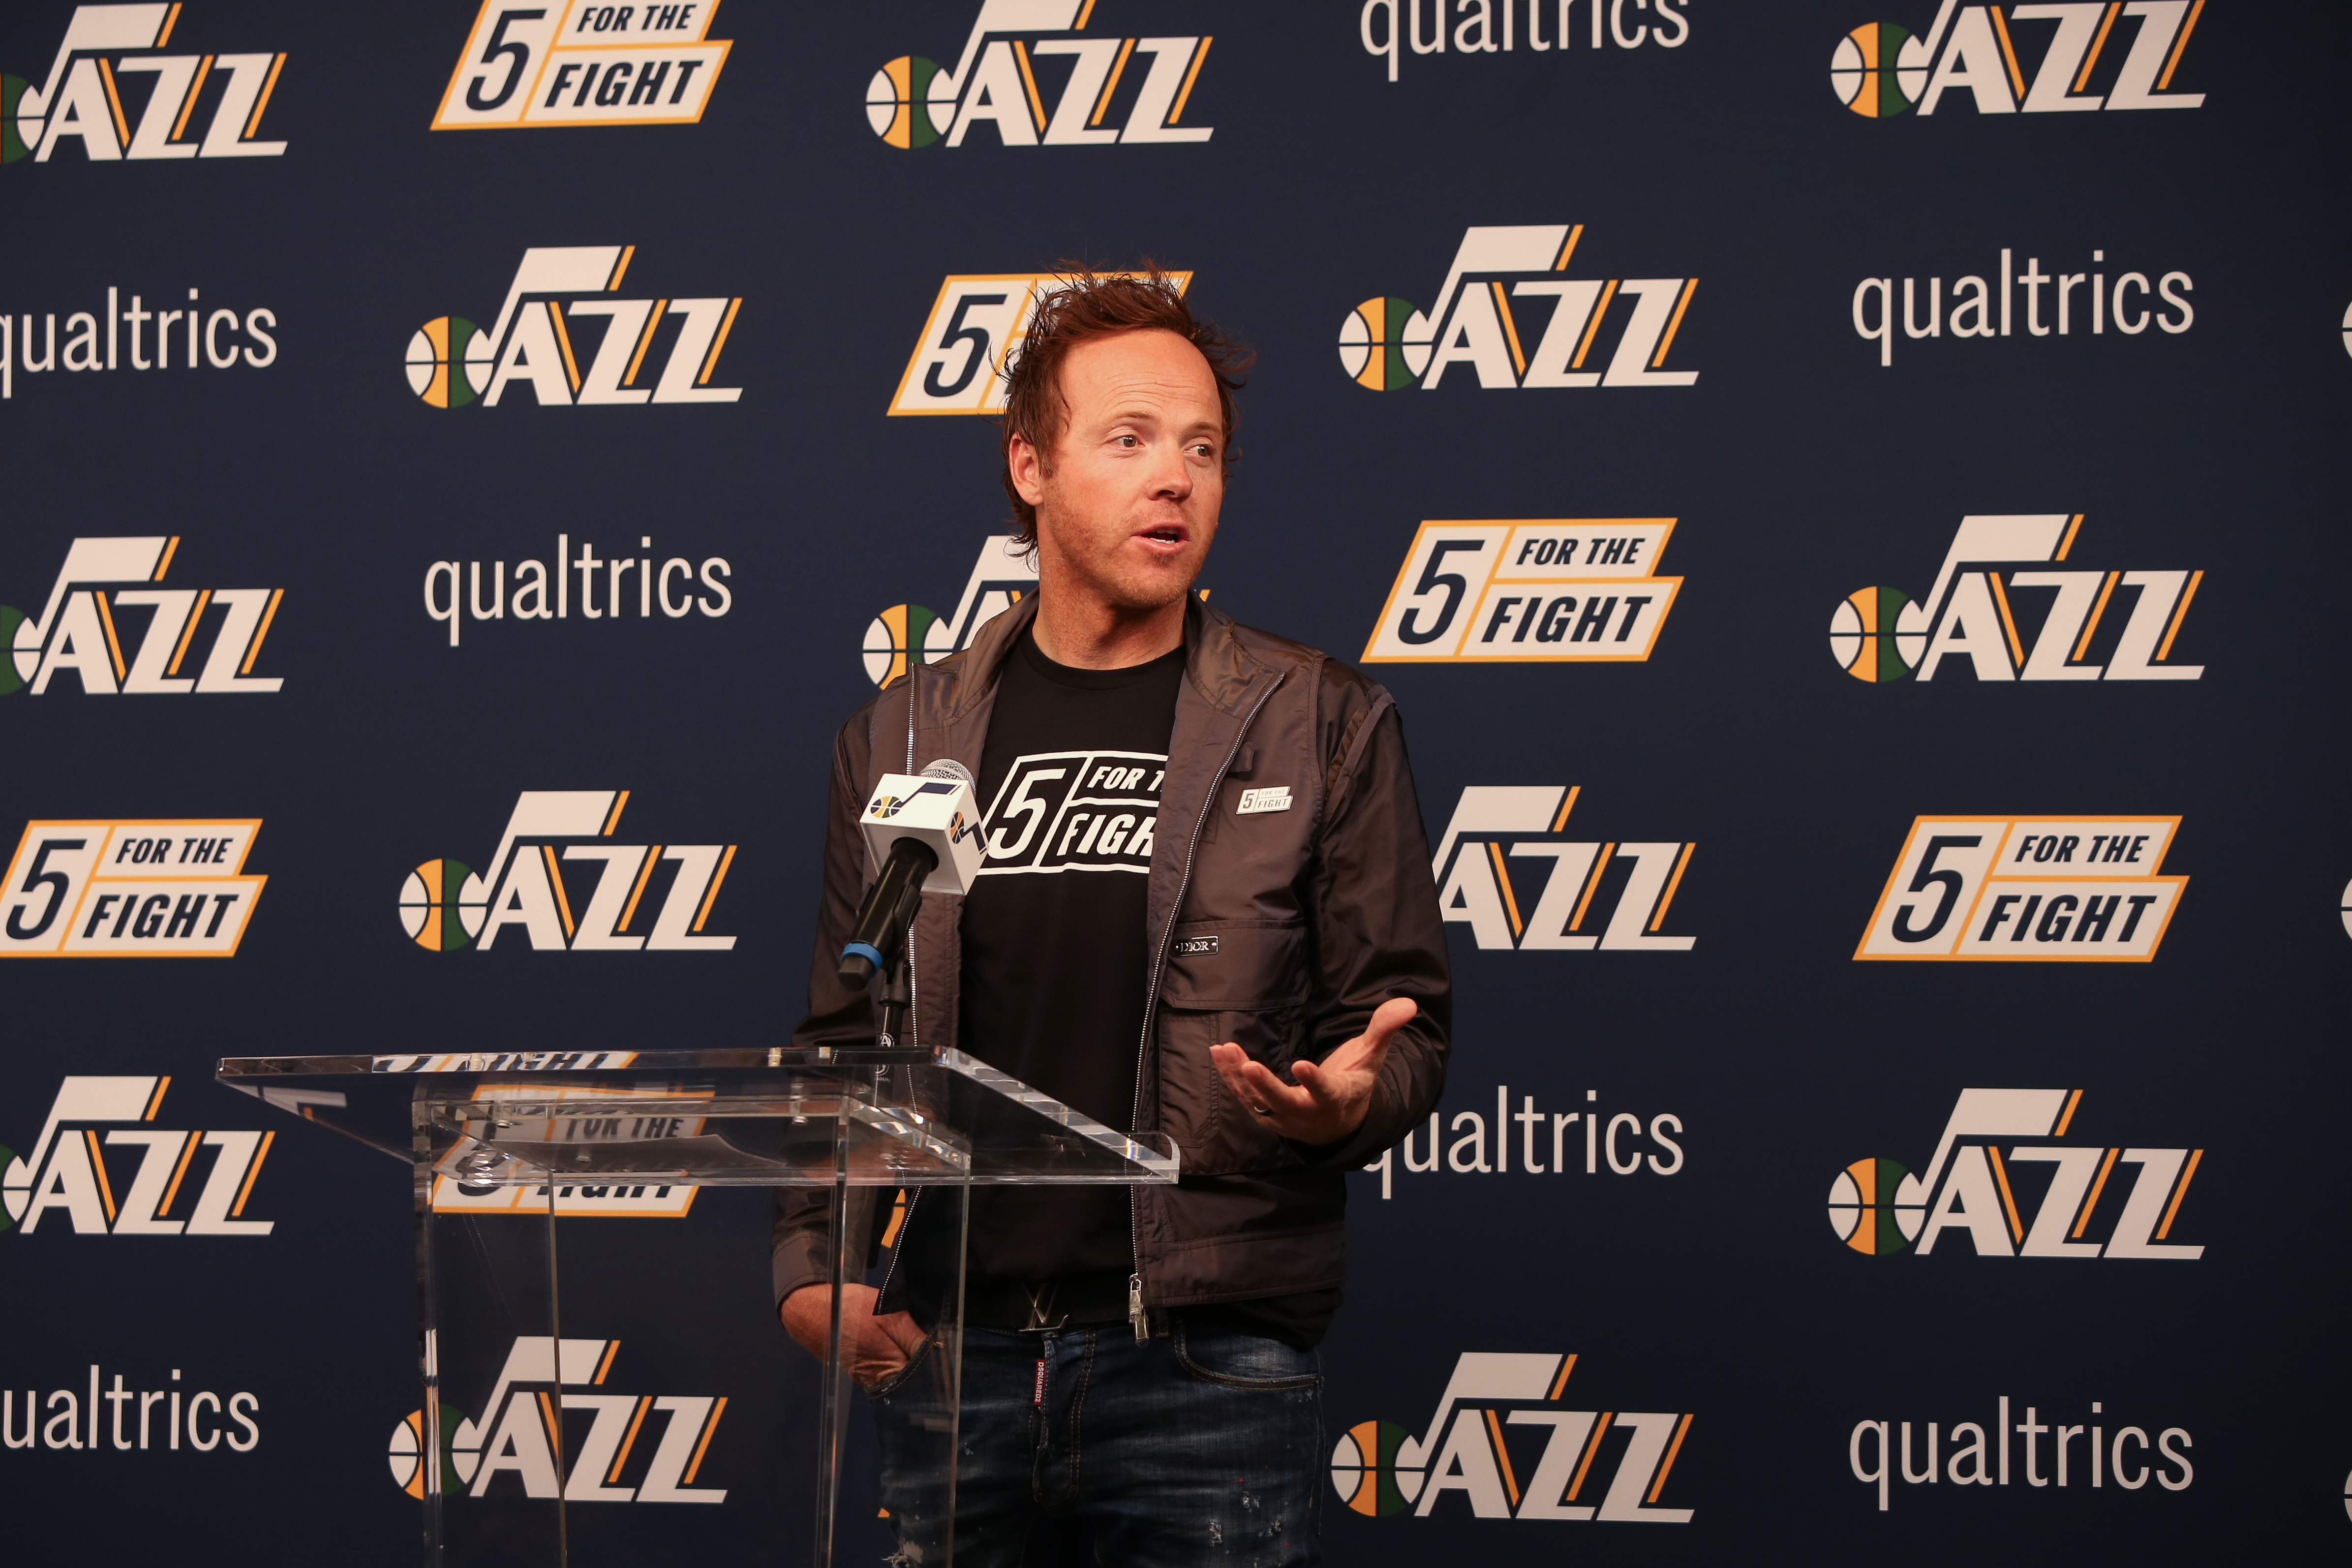 Utah Jazz Jersey Patch Announcement